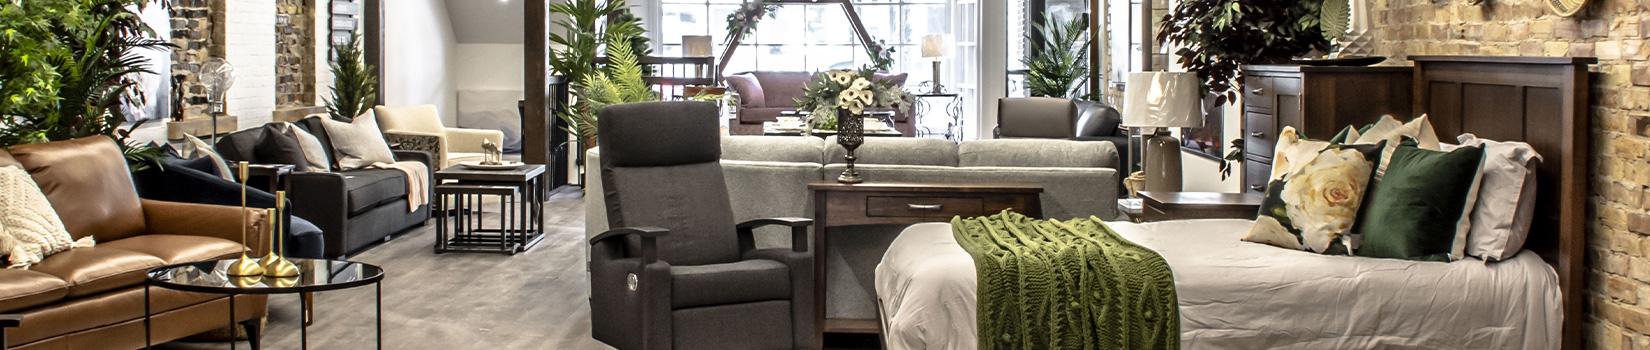 Chervin Furniture and Design